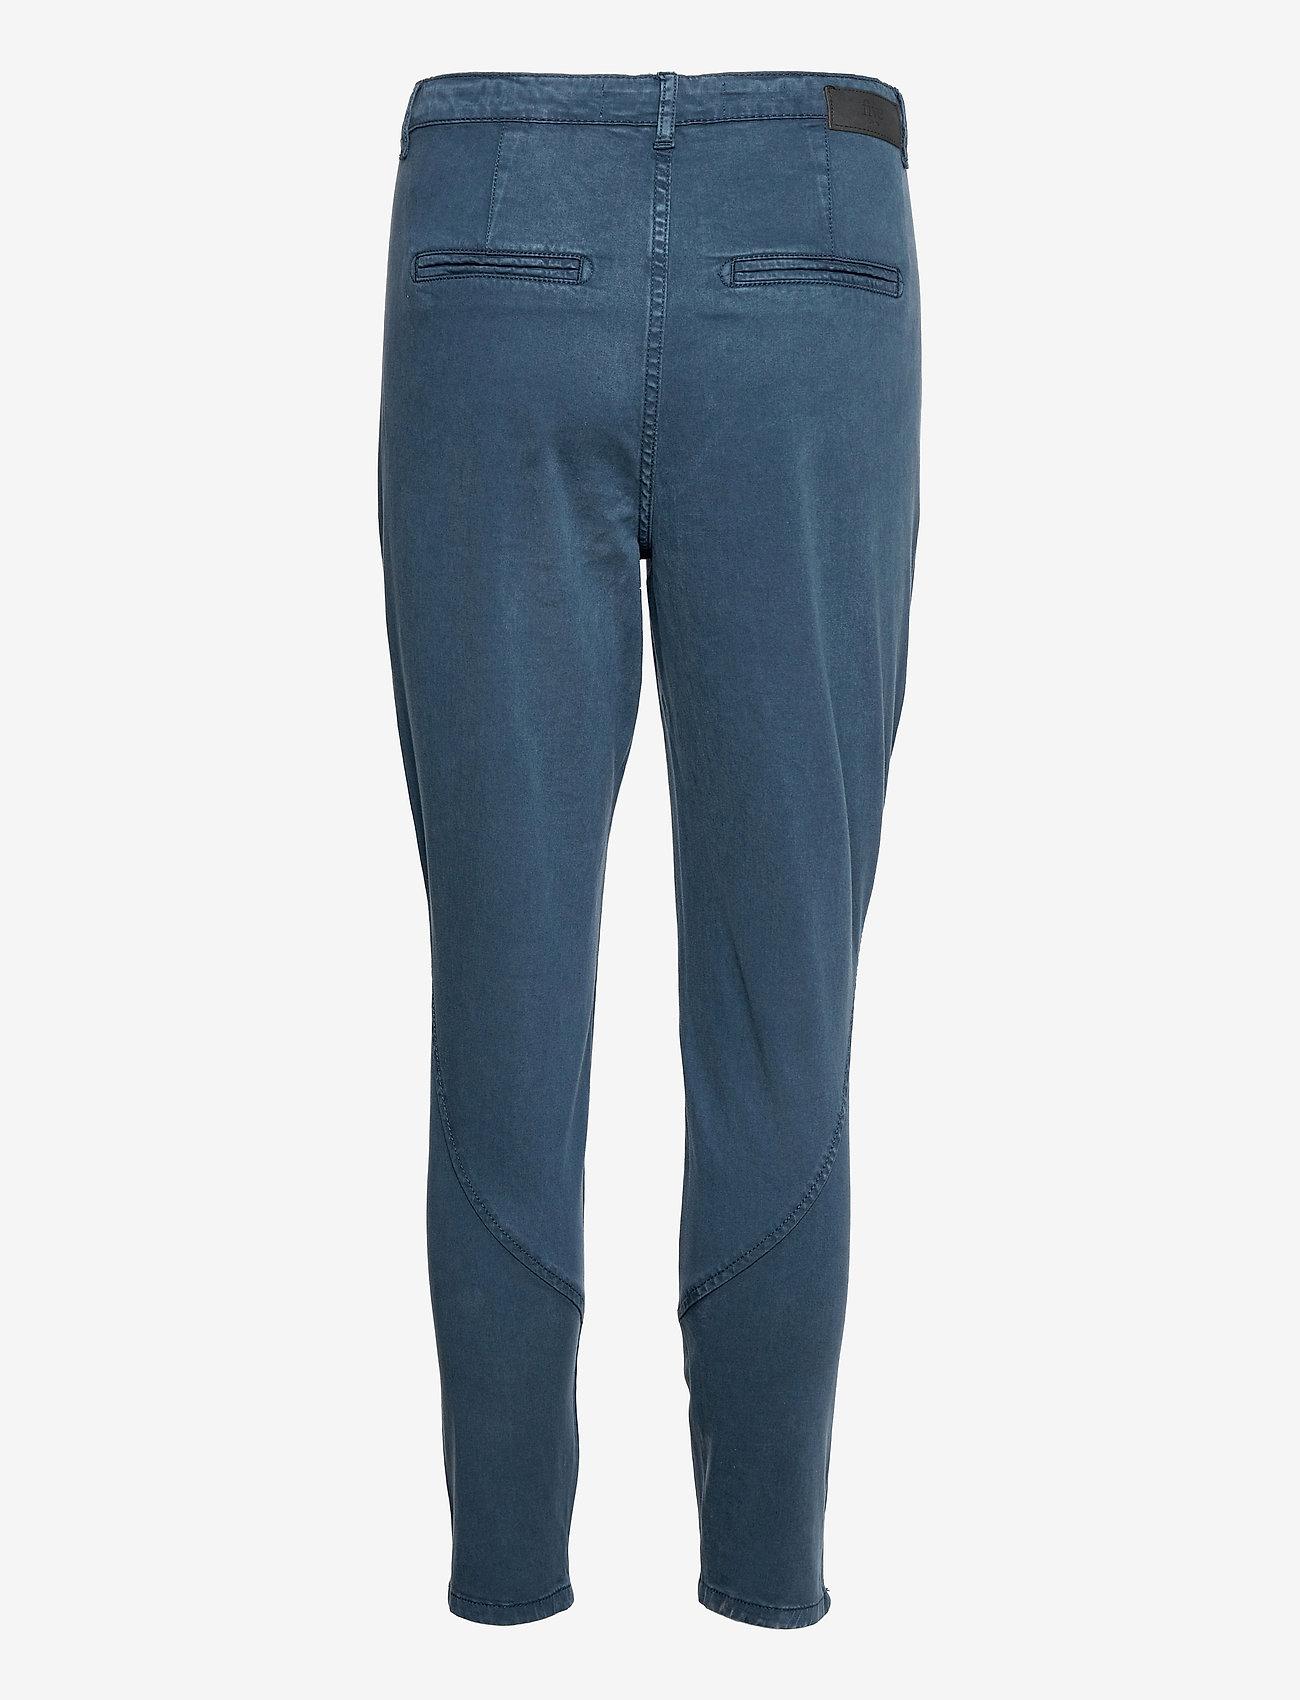 FIVEUNITS - Jolie Zip 432 - skinny jeans - ink - 1